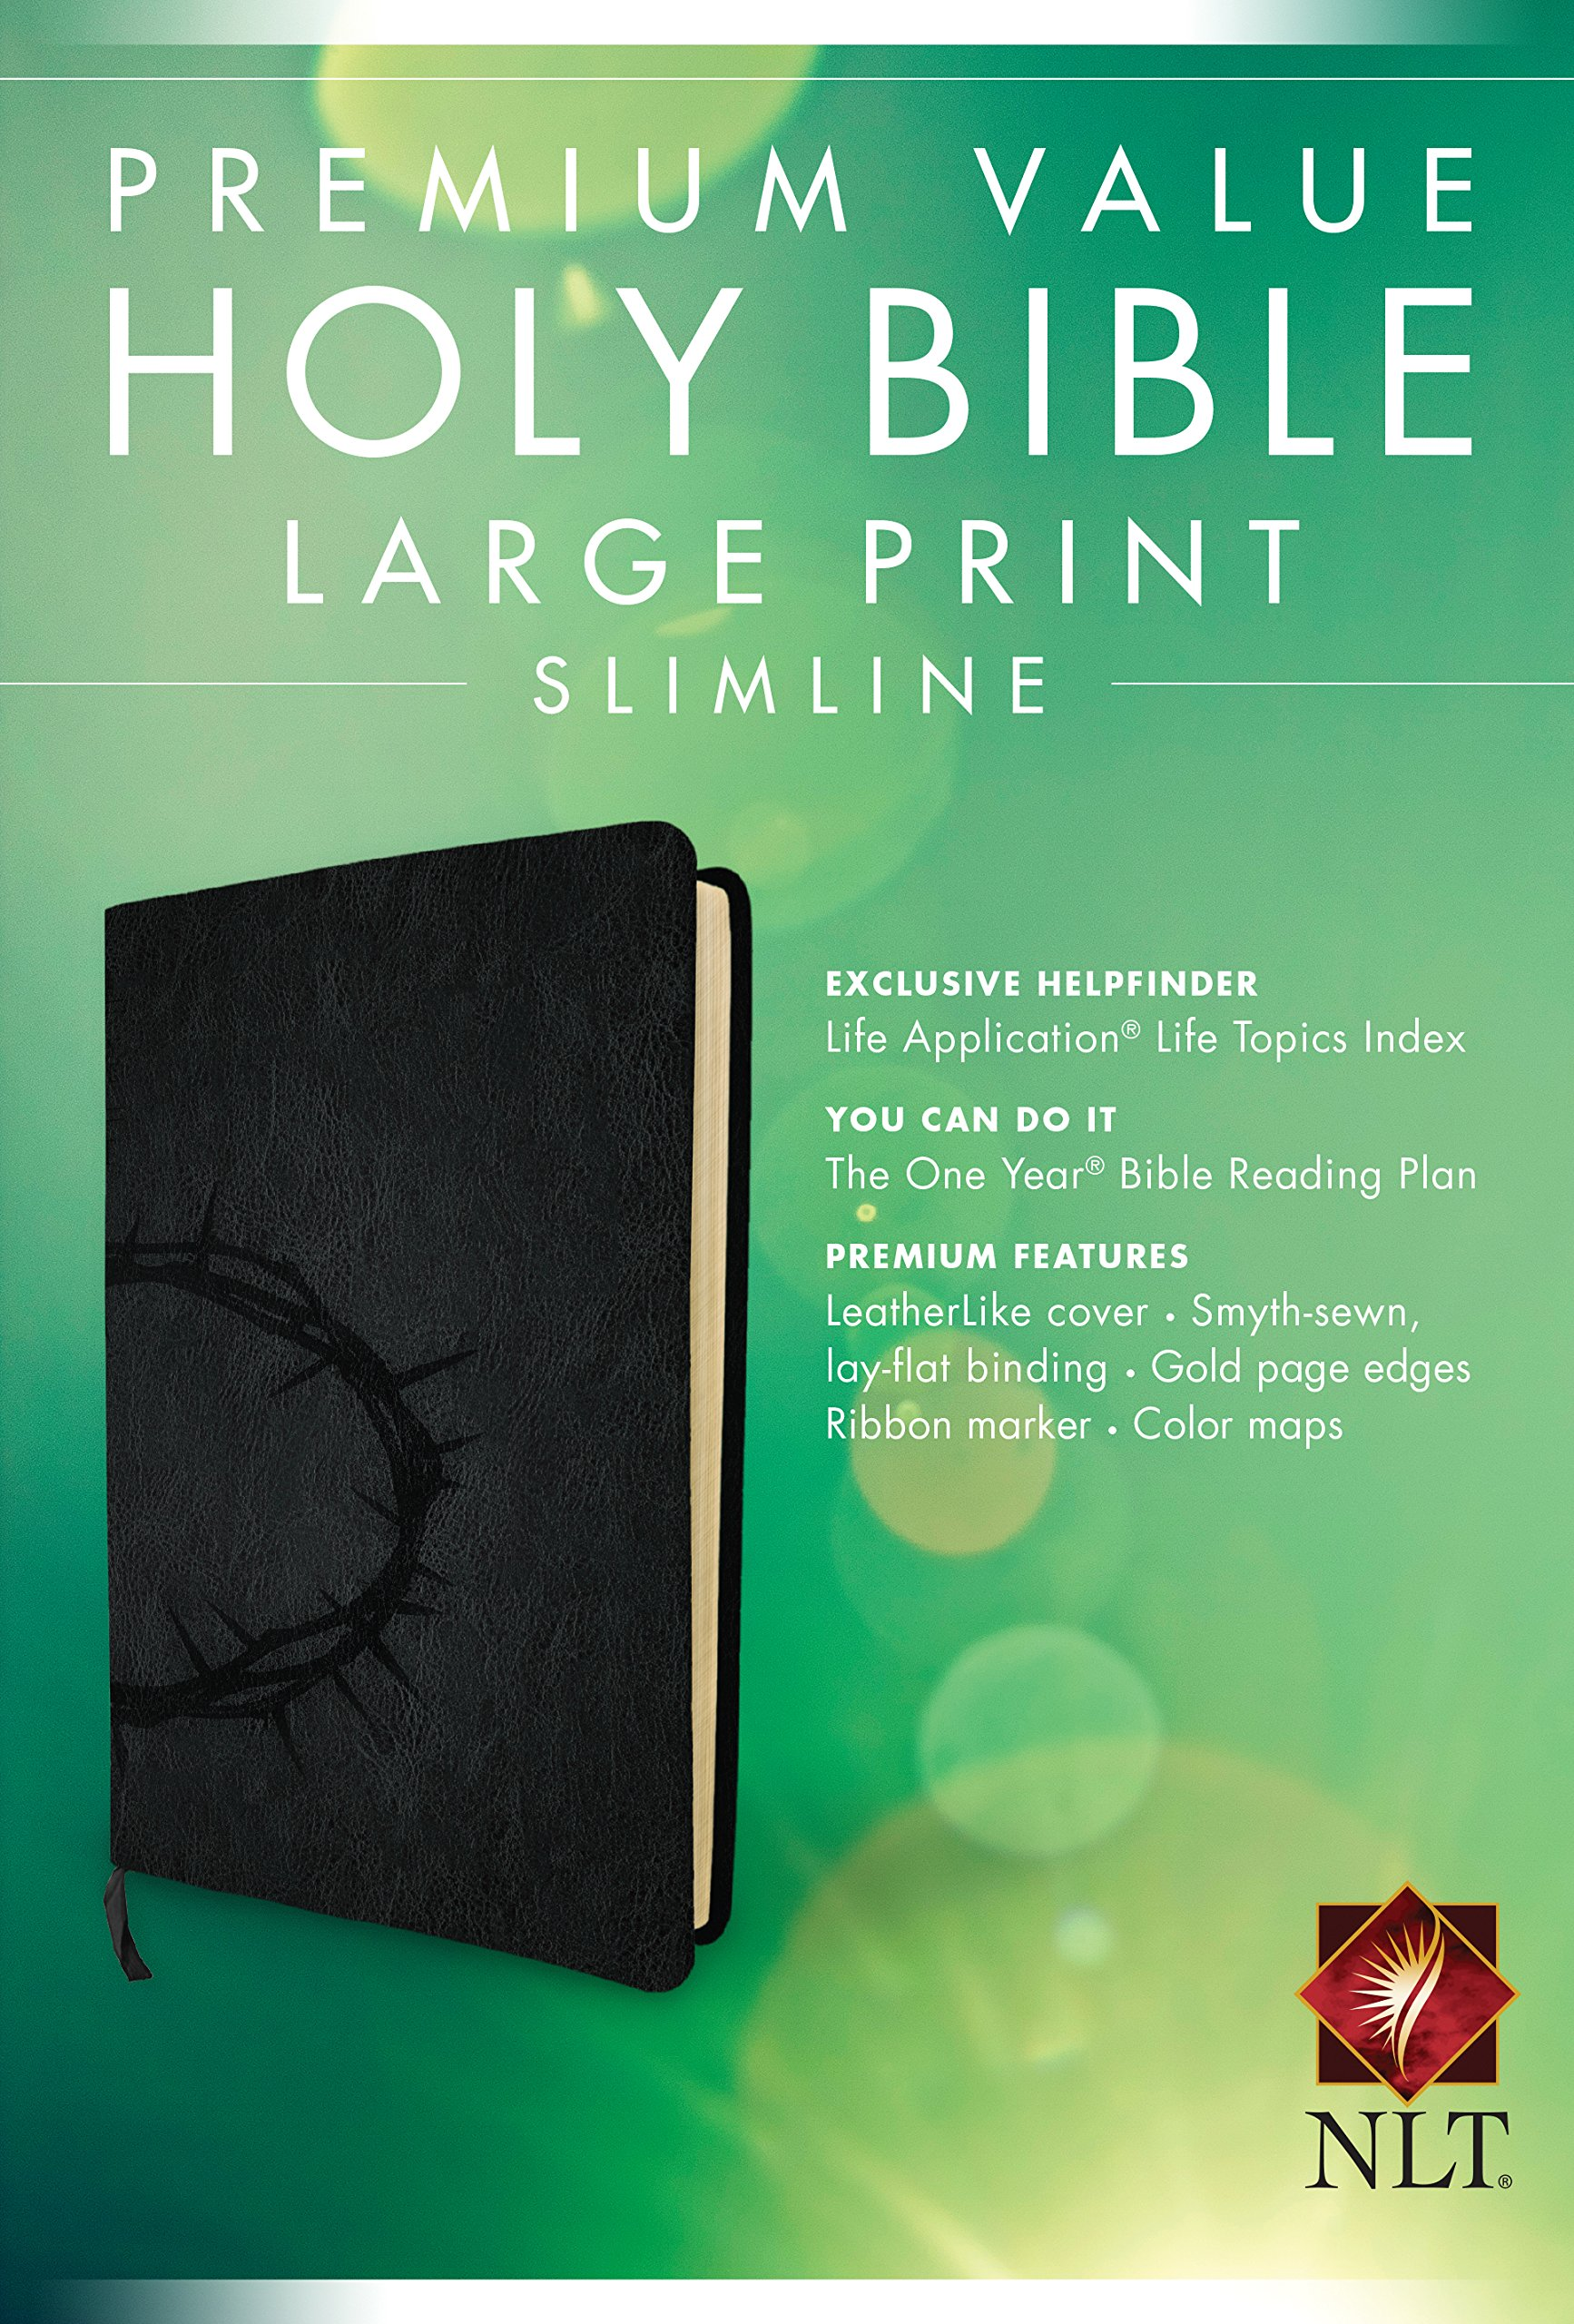 Premium Value Slimline Bible Large Print NLT, Crown